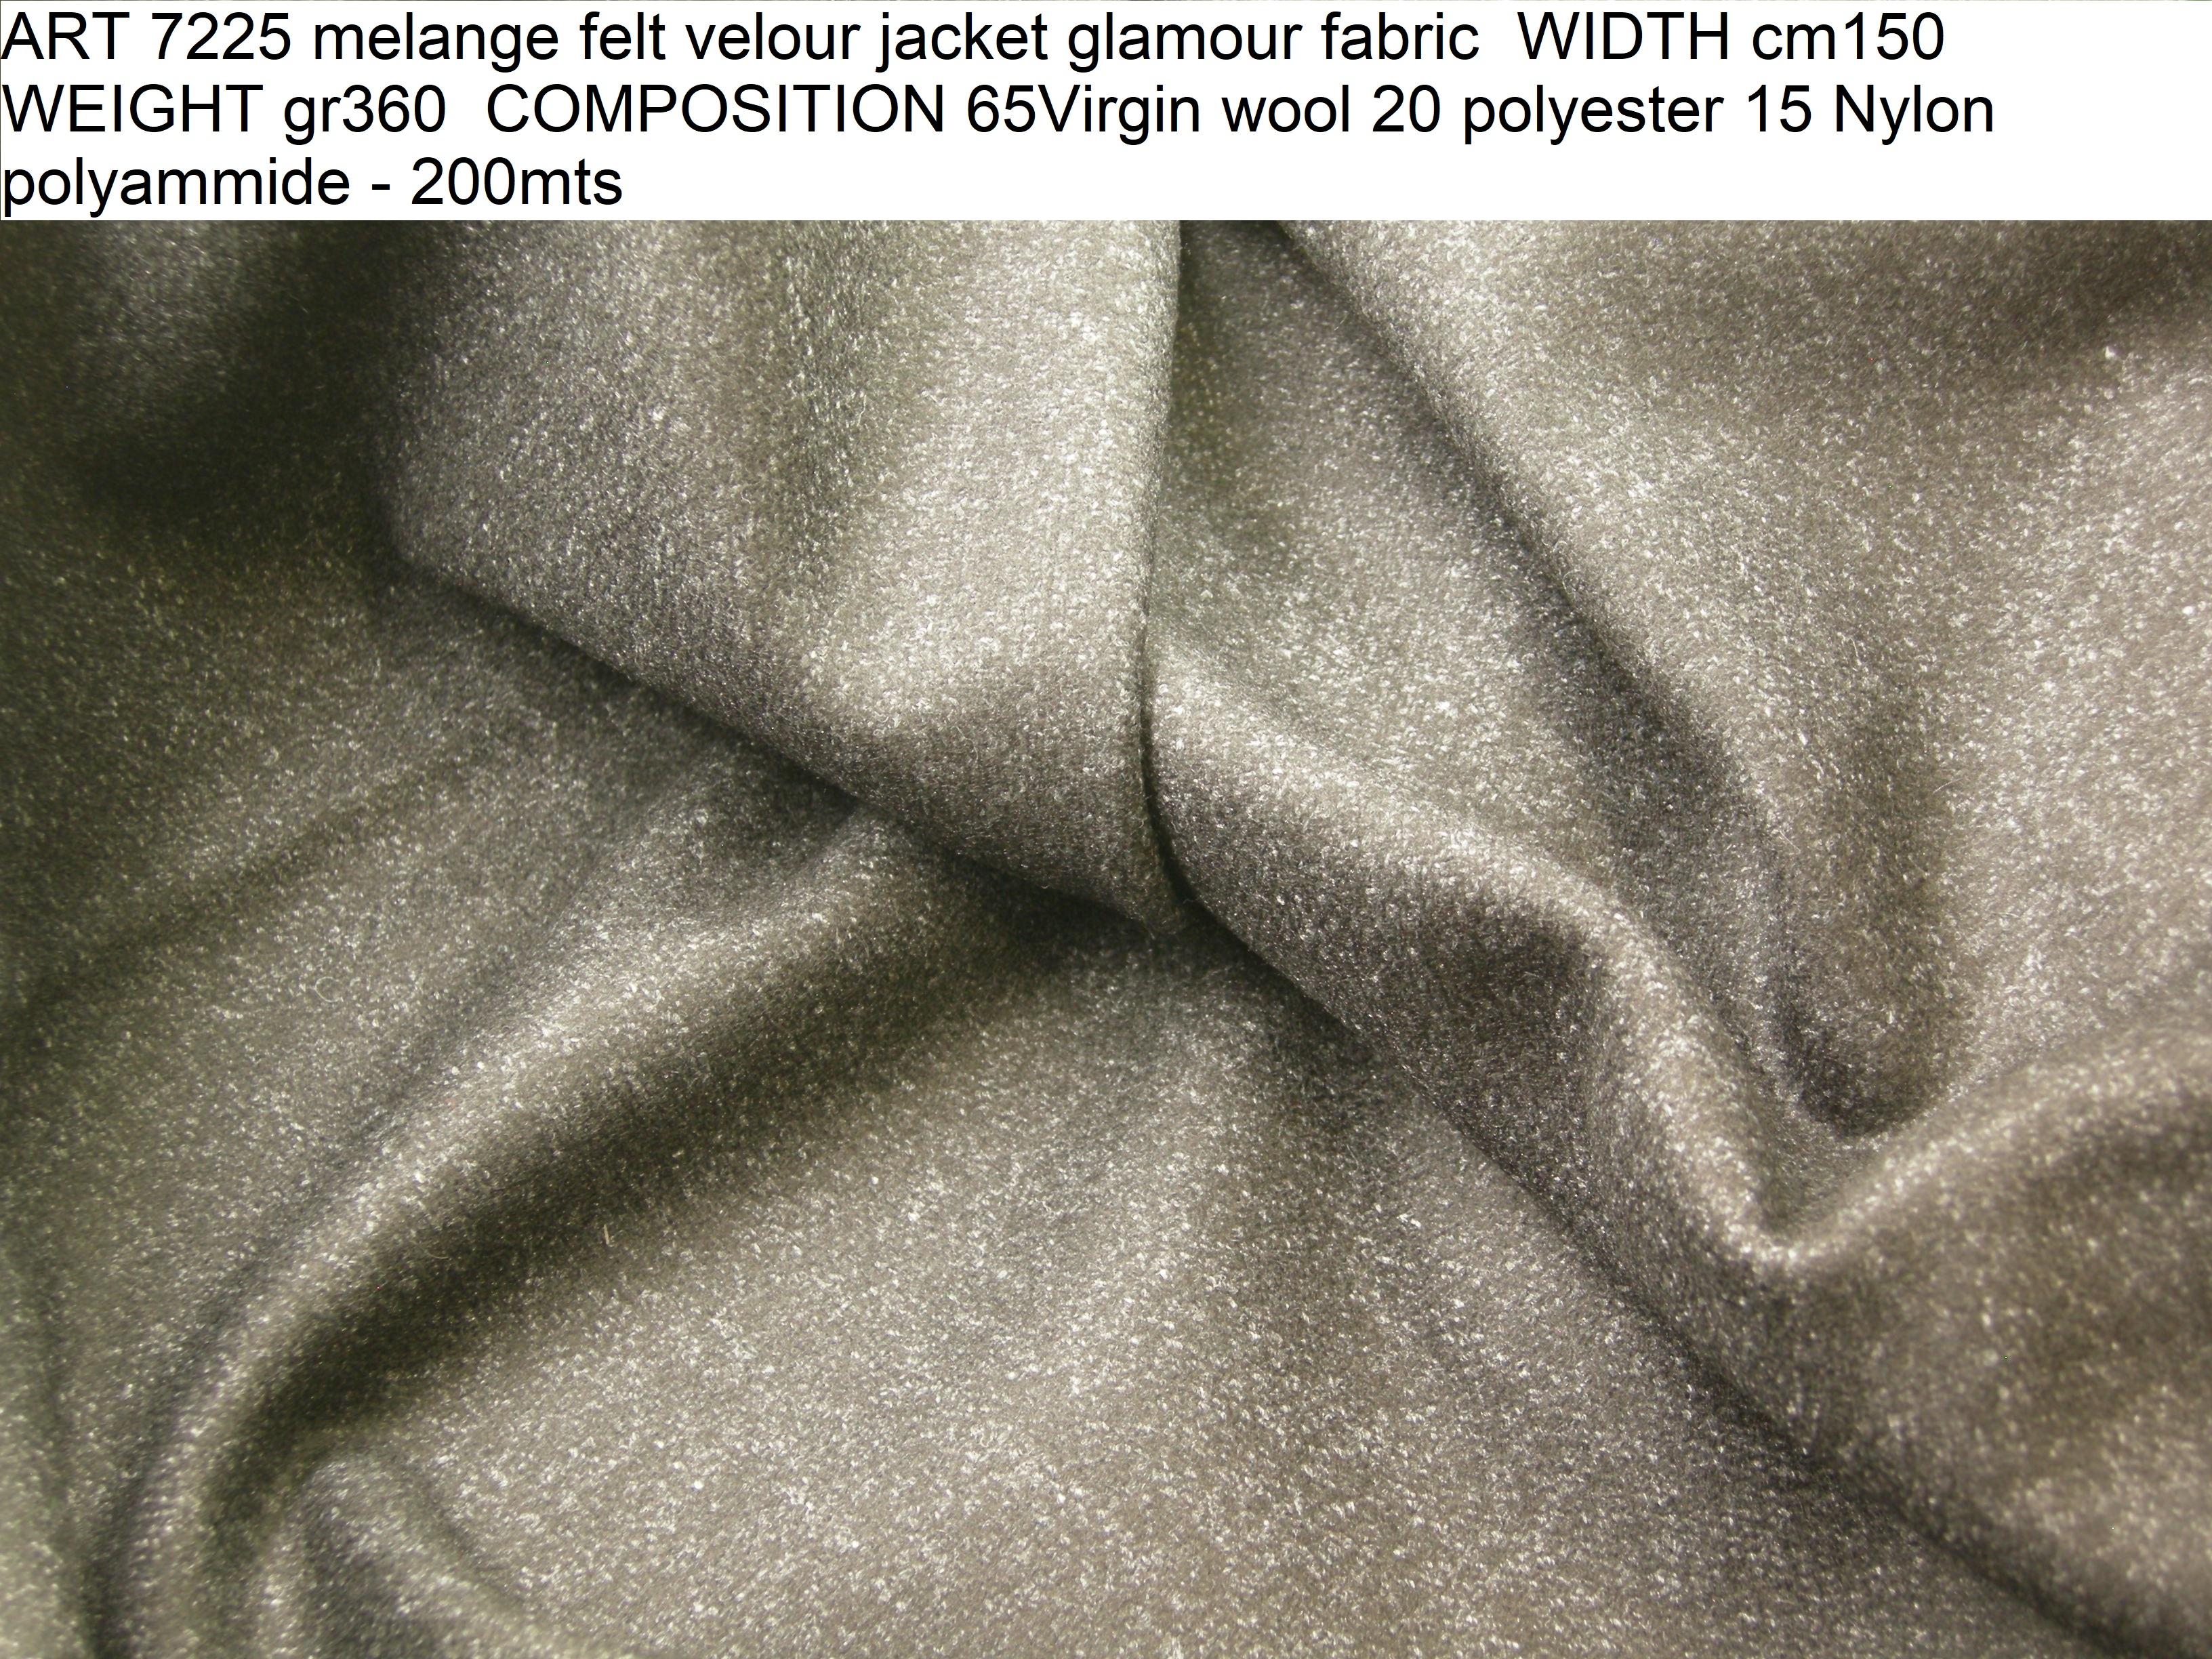 ART 7225 melange felt velour jacket glamour fabric WIDTH cm150 WEIGHT gr360 COMPOSITION 65Virgin wool 20 polyester 15 Nylon polyammide - 200mts